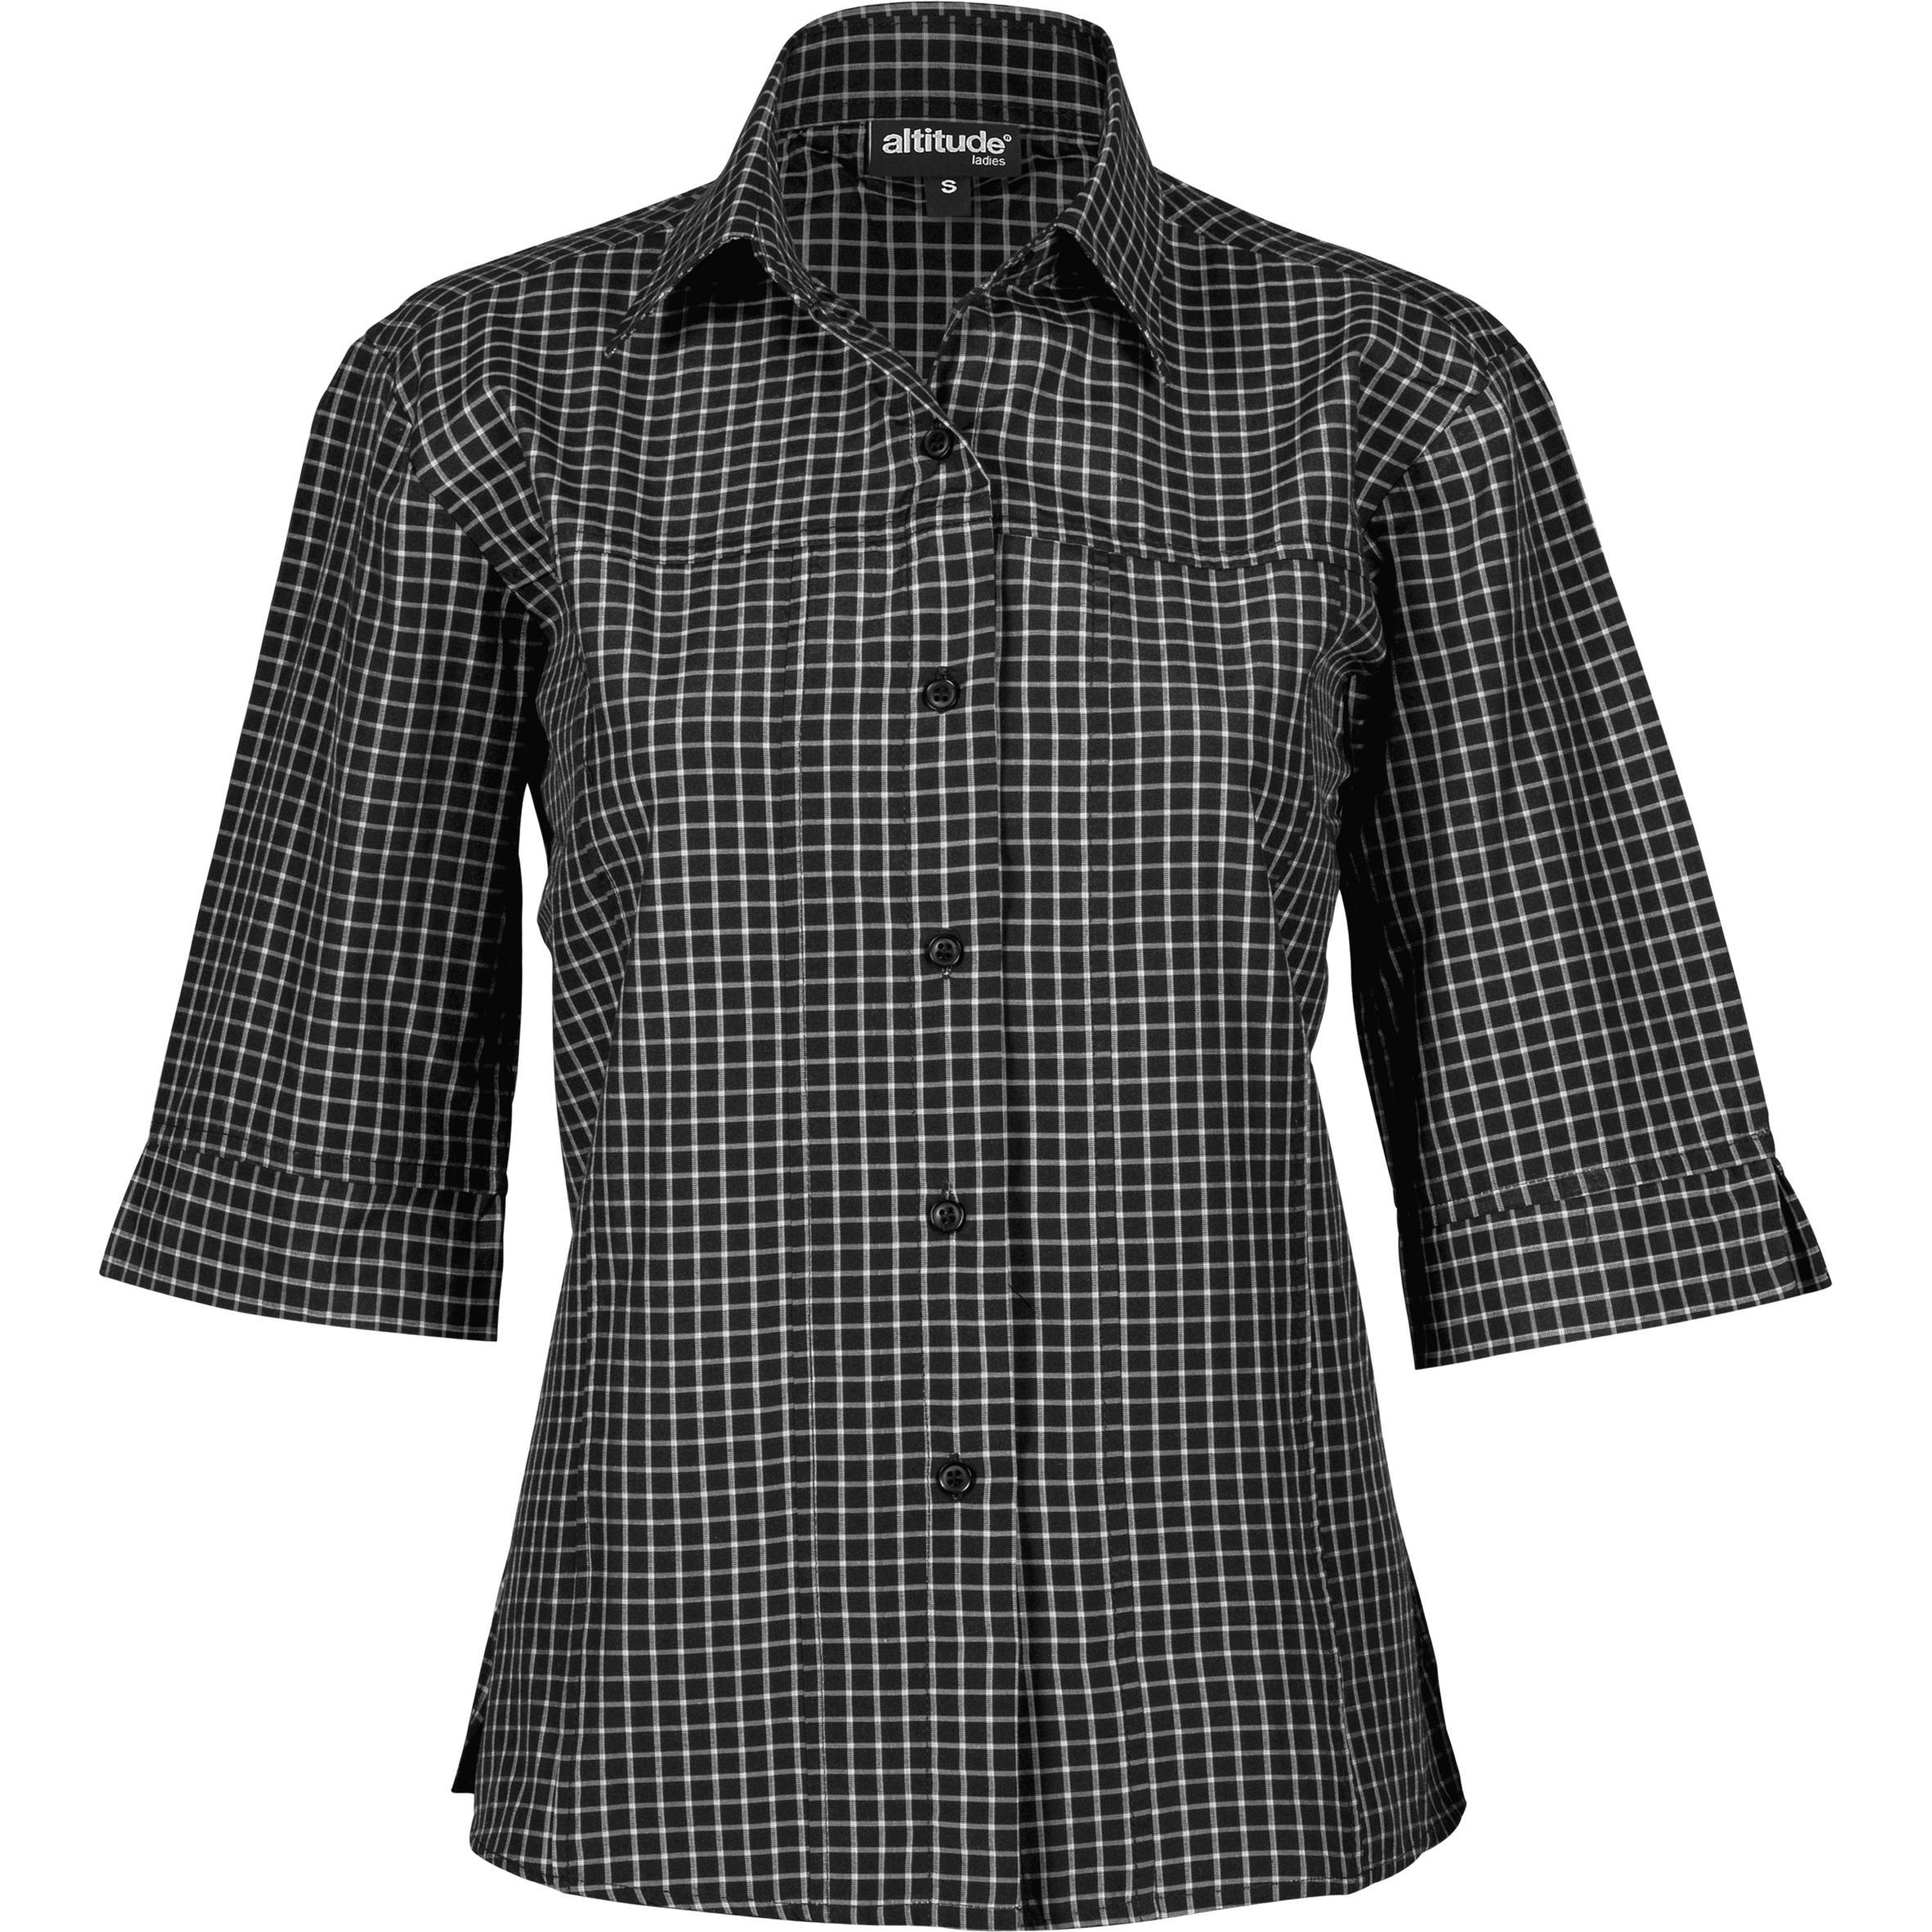 Ladies 3/4 Sleeve Prestige Shirt